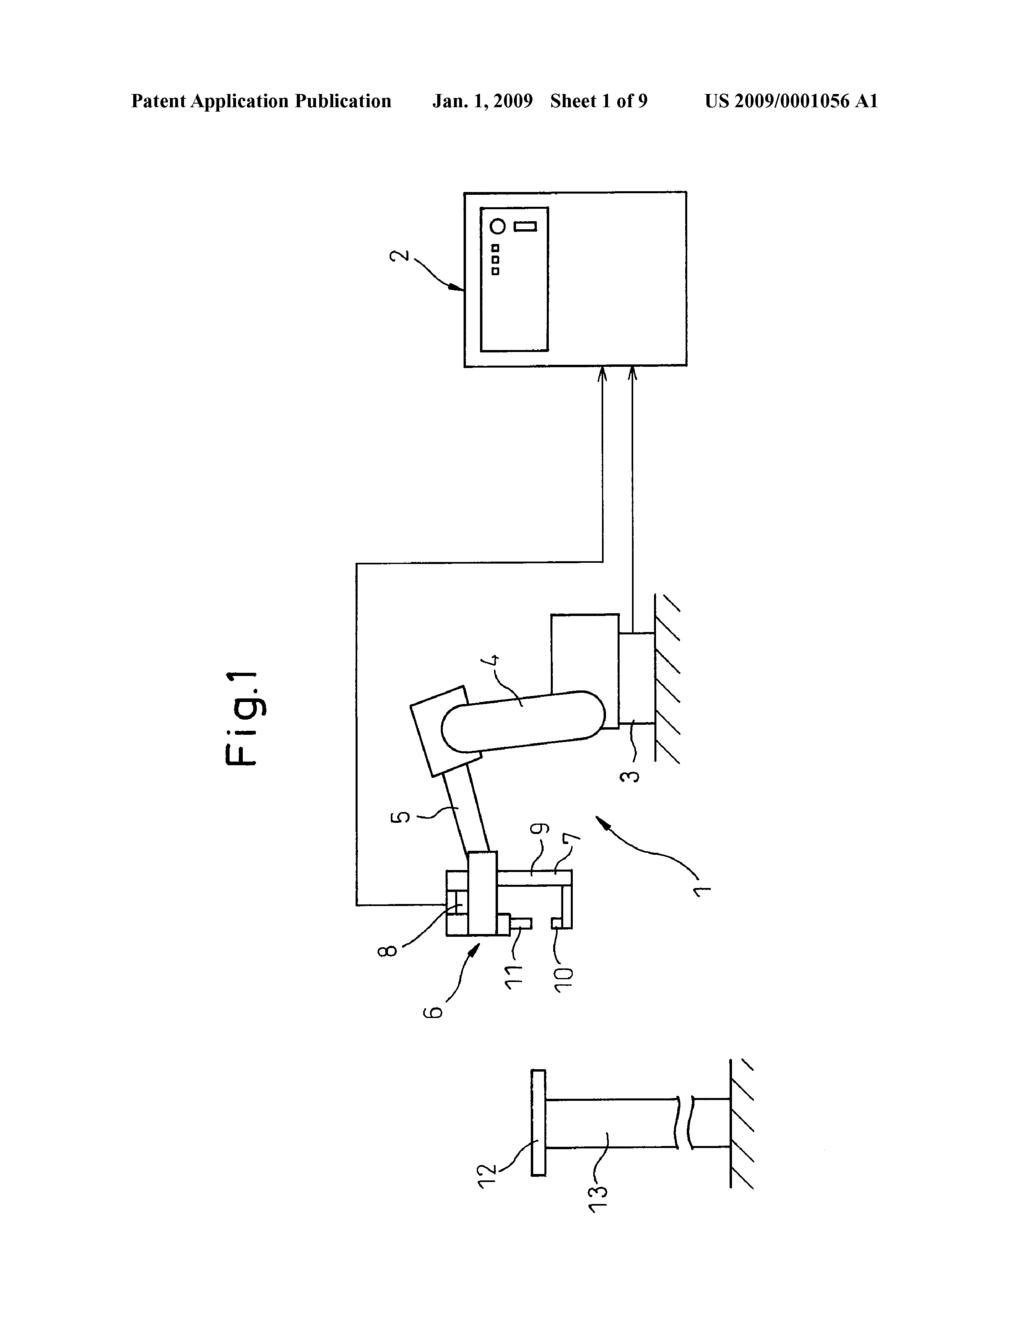 positioning method of spot welding robot diagram, schematic, and arc welding diagram positioning method of spot welding robot diagram, schematic, and image 02